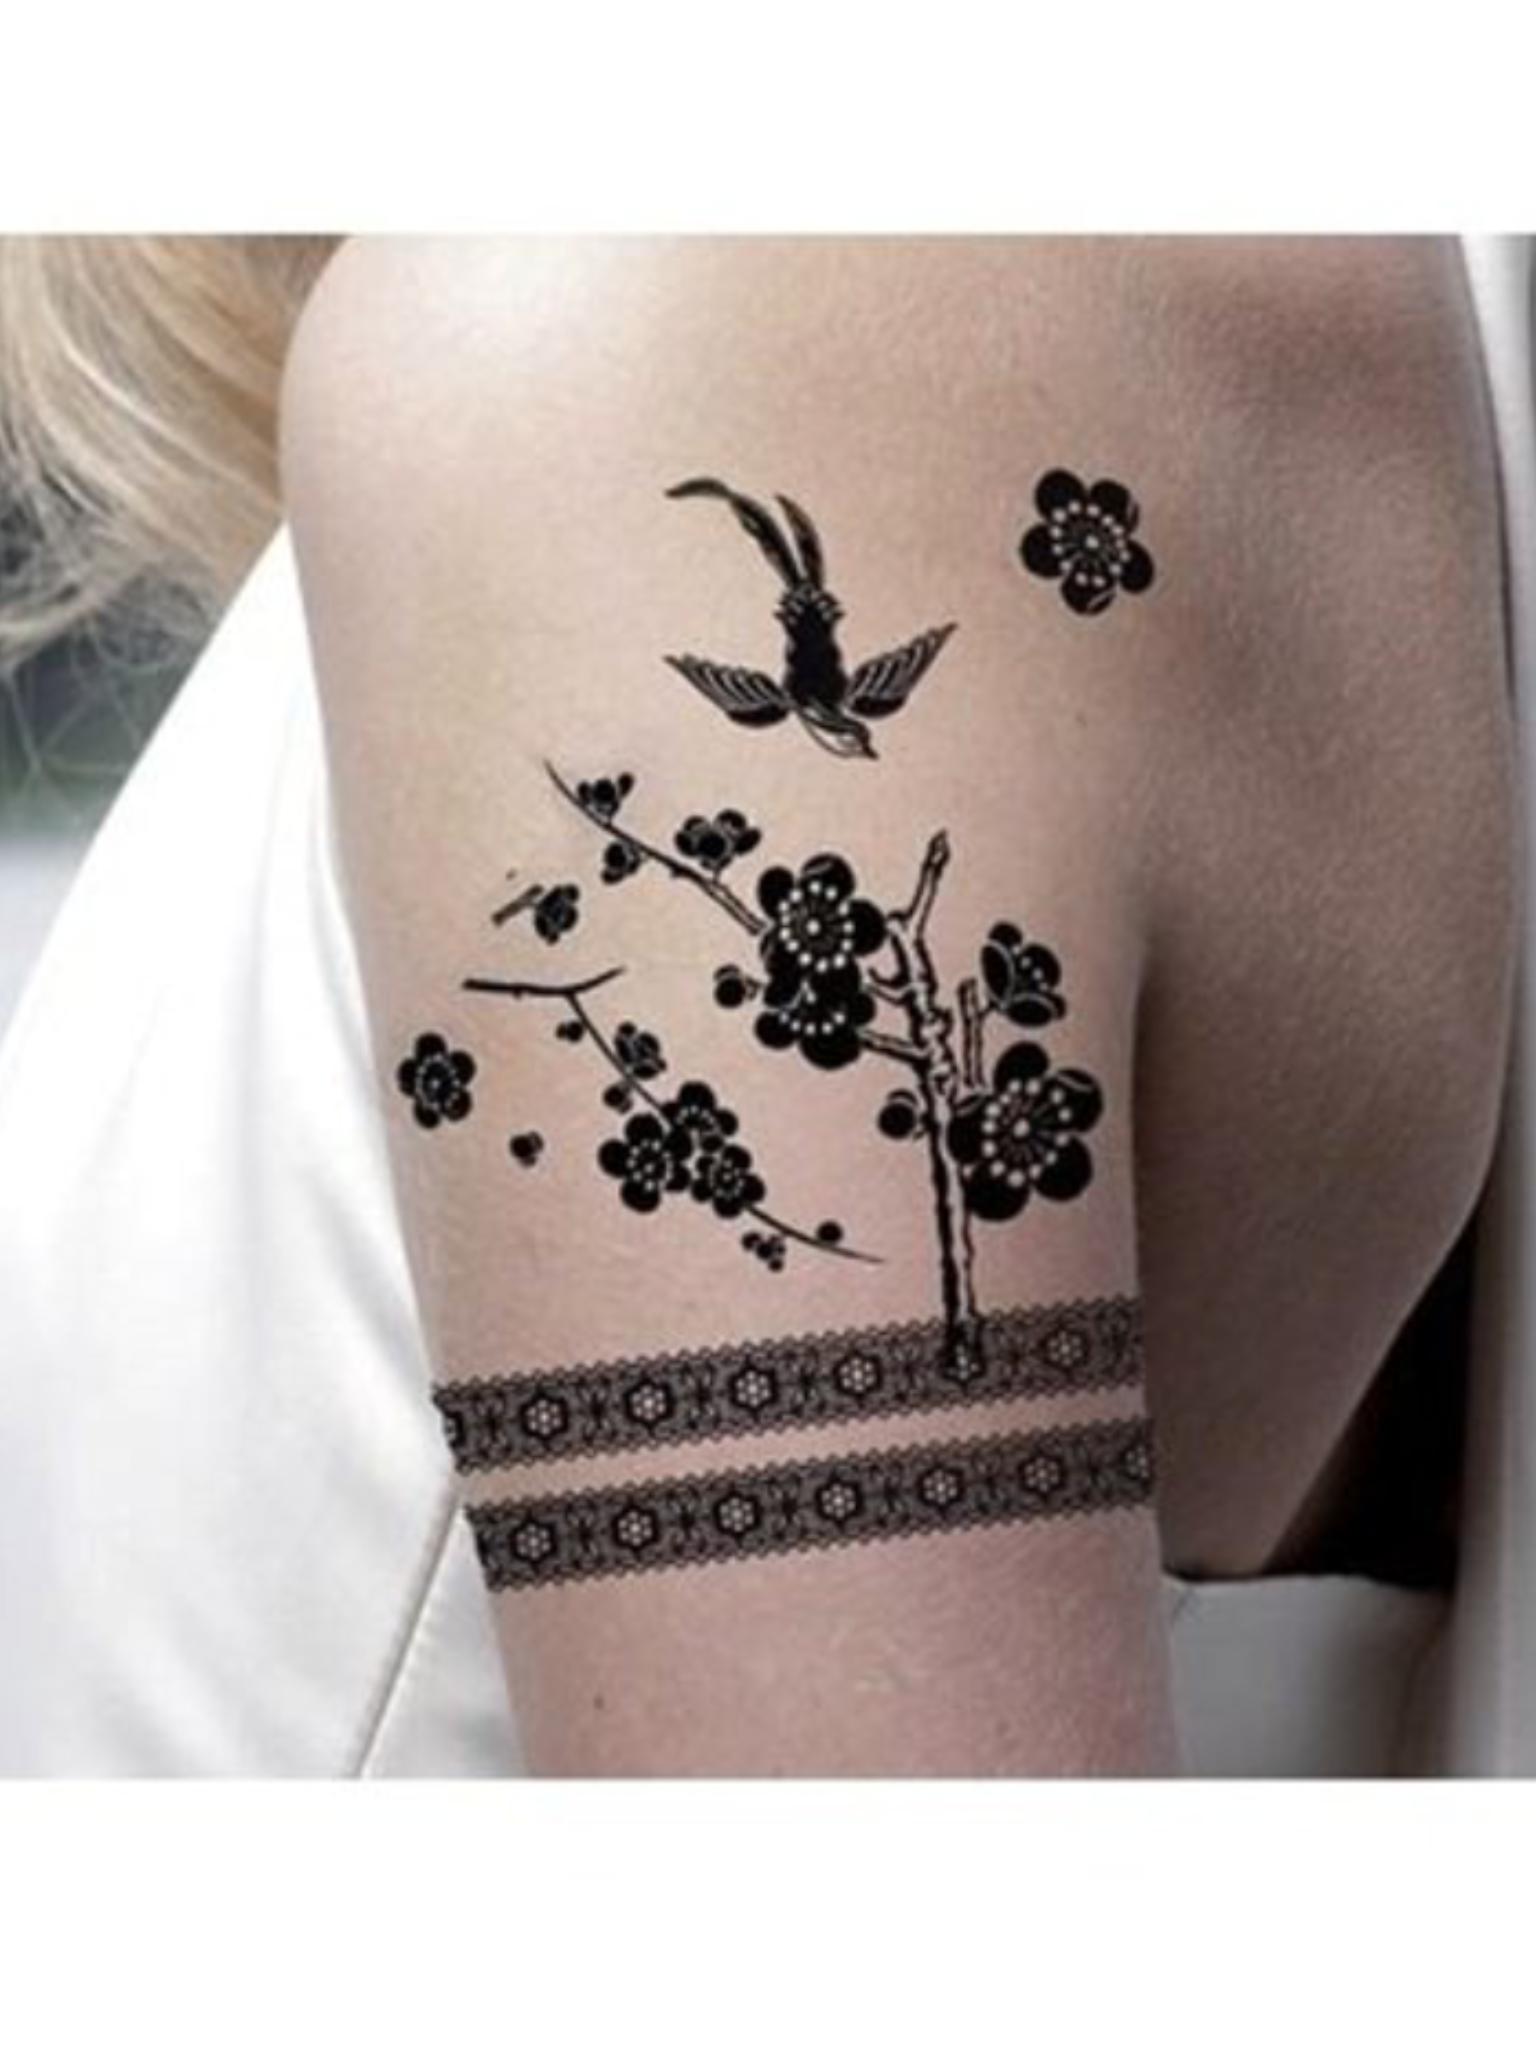 Pin By Julia Restivo On Tattoo Ideas Armband Tattoo Design Tattoo Designs Tattoos